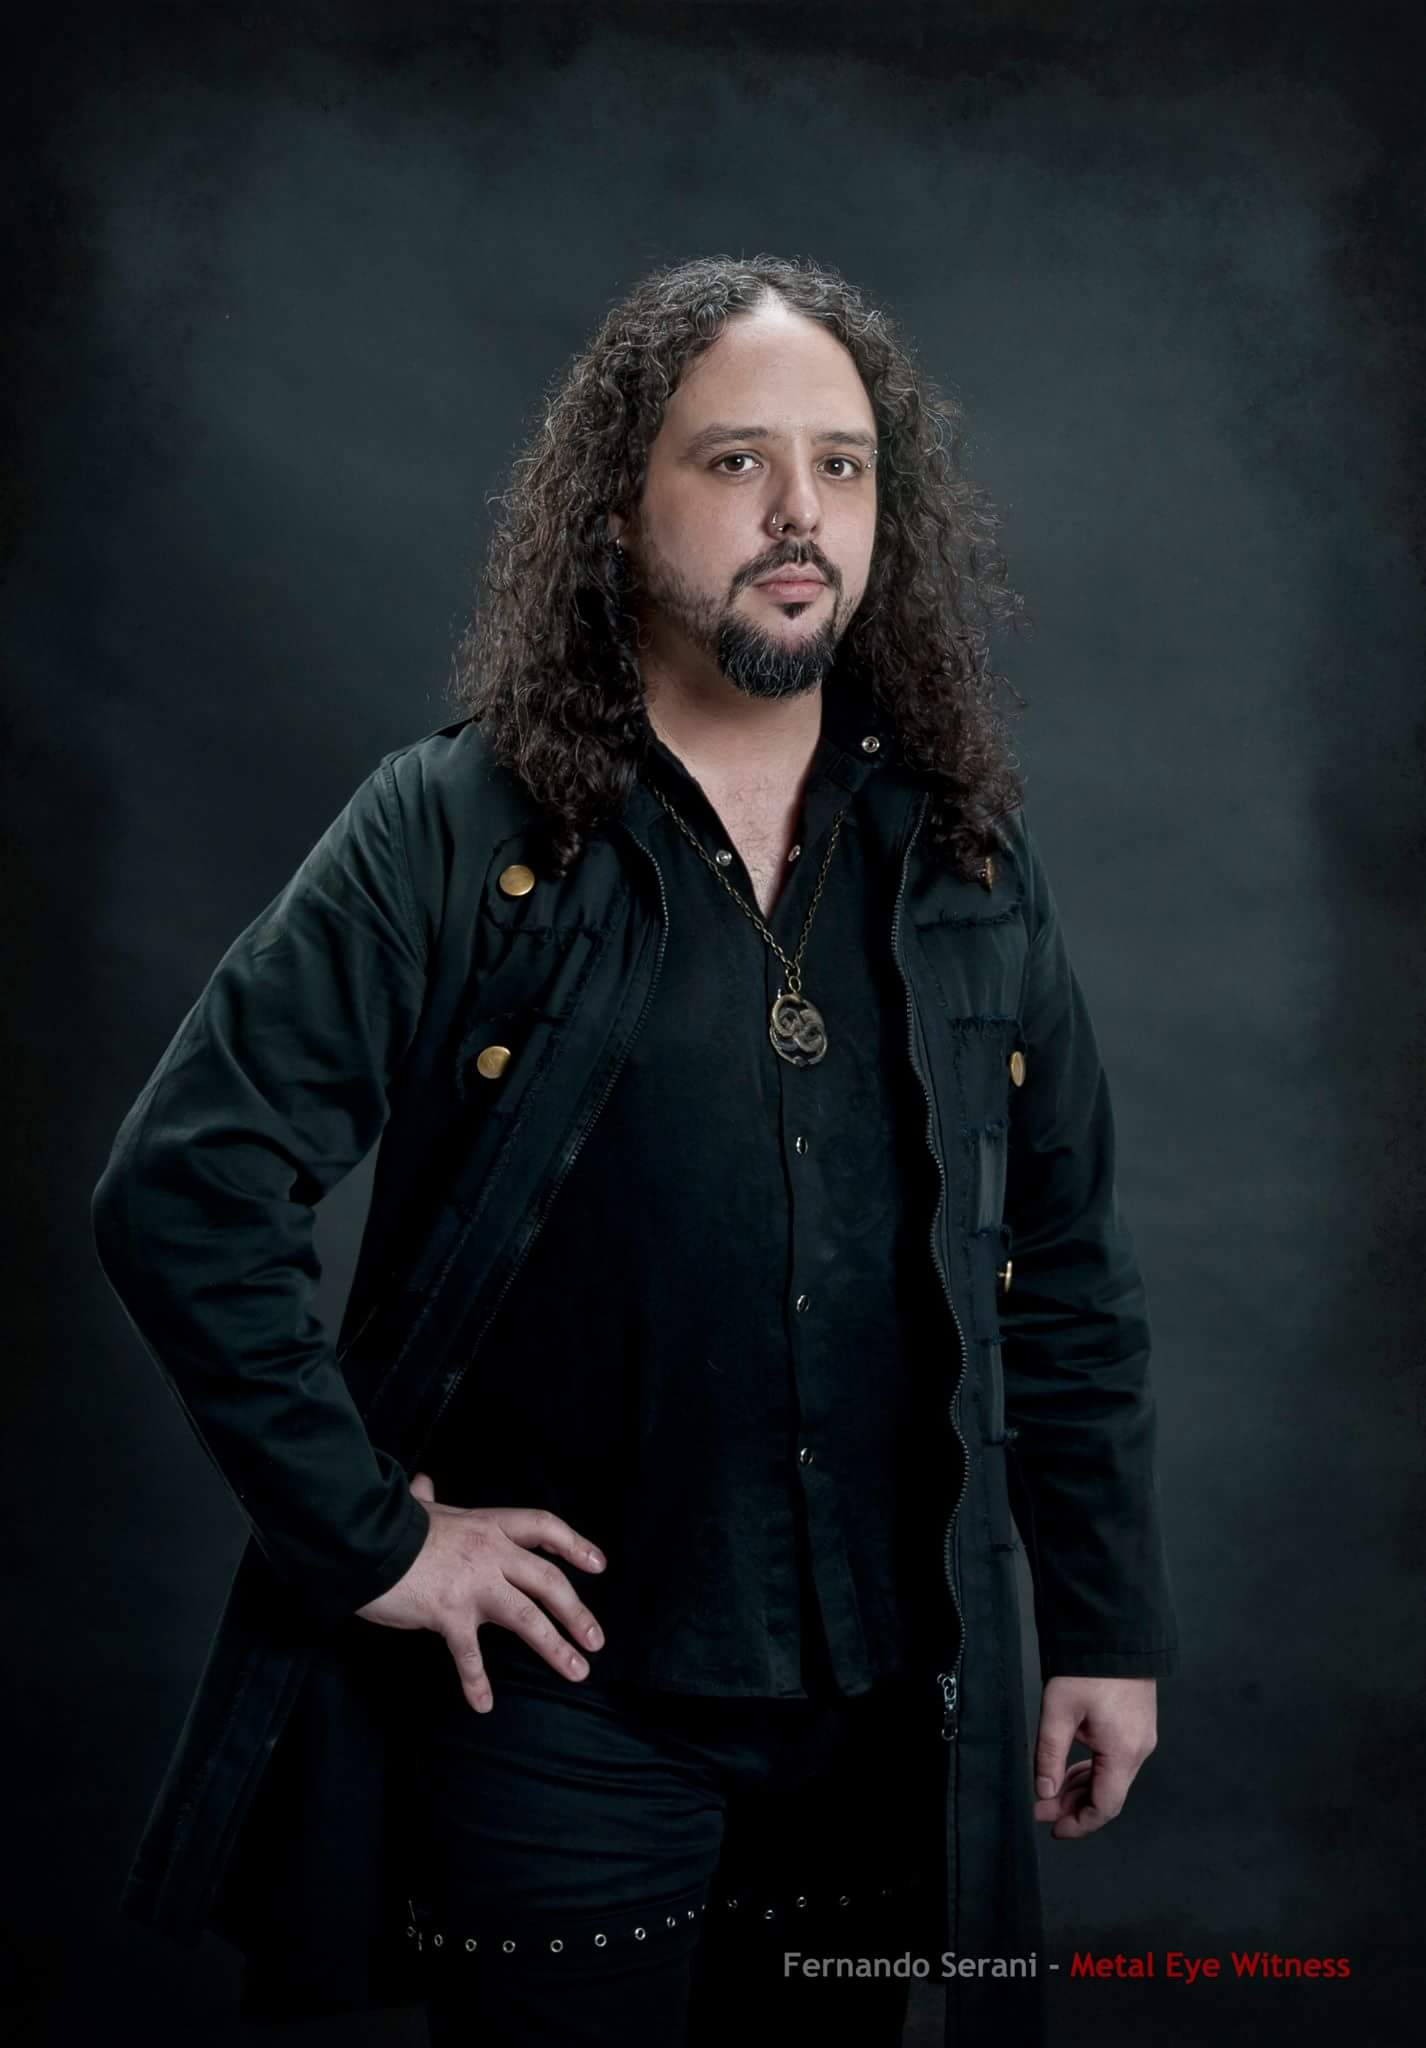 Rodrigo Alejandro Gudiña